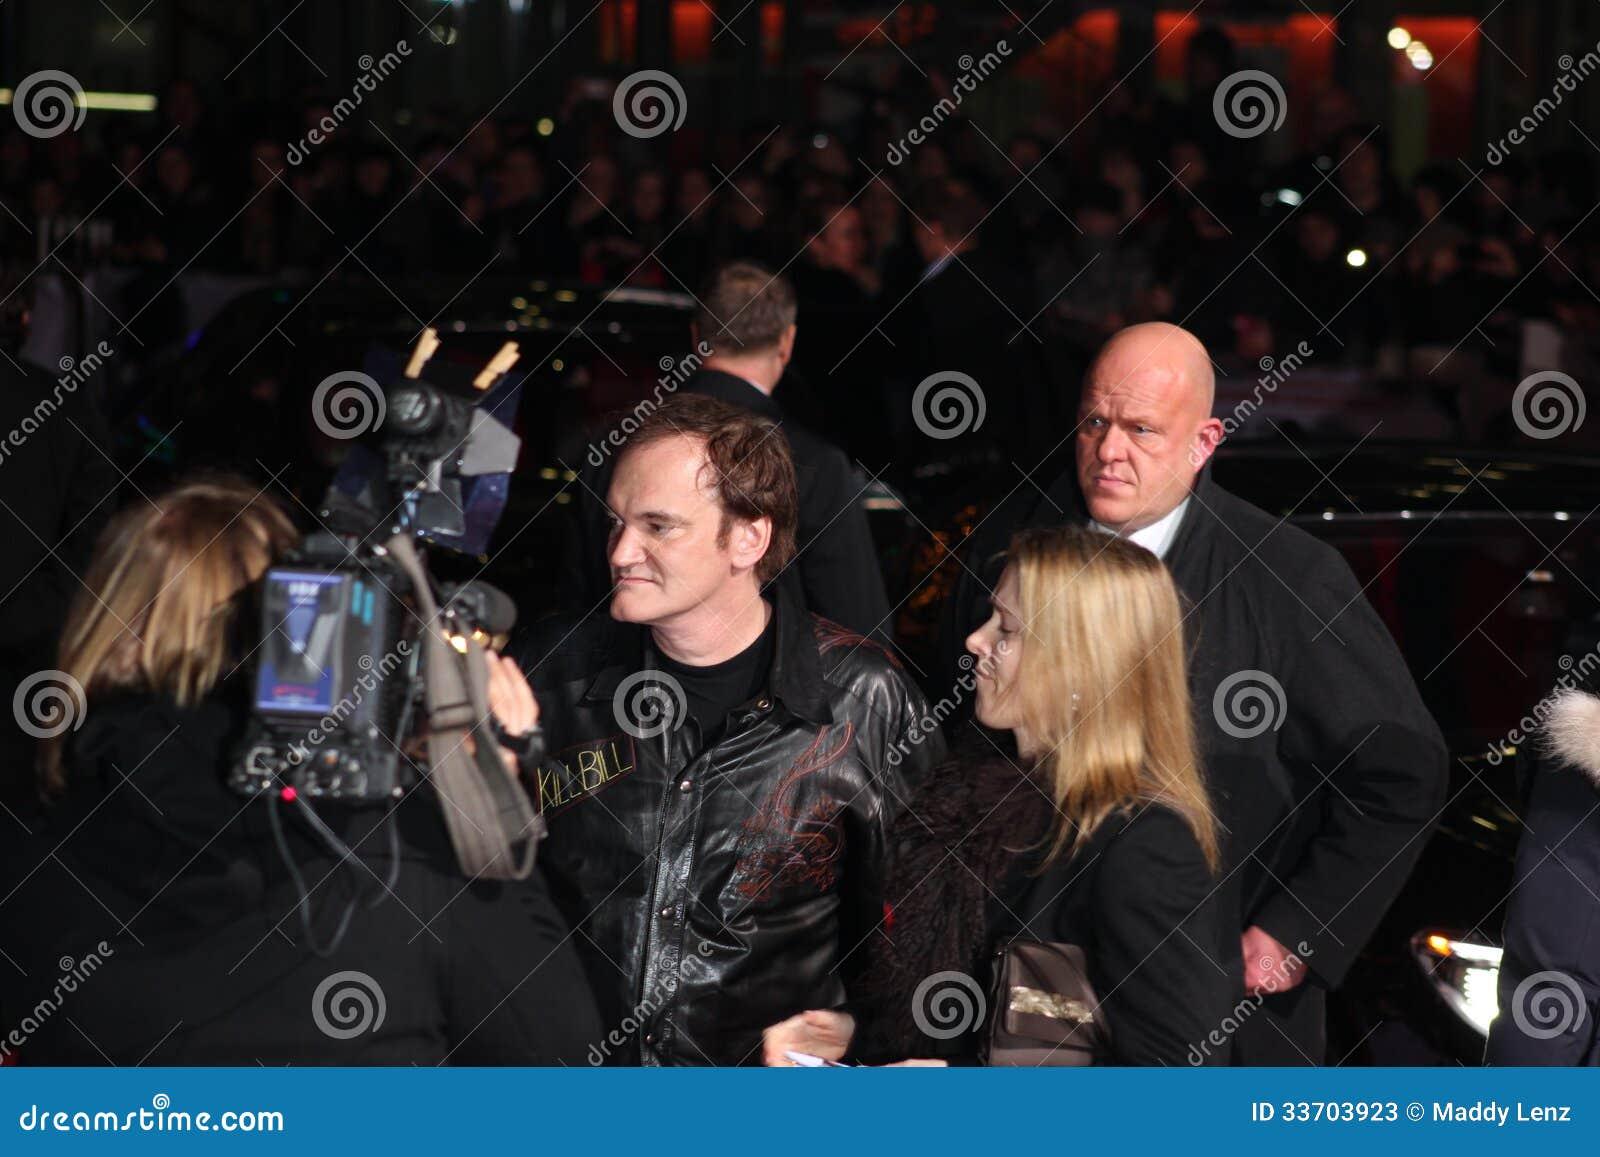 Quentin Tarantino - Django Unchained - Première